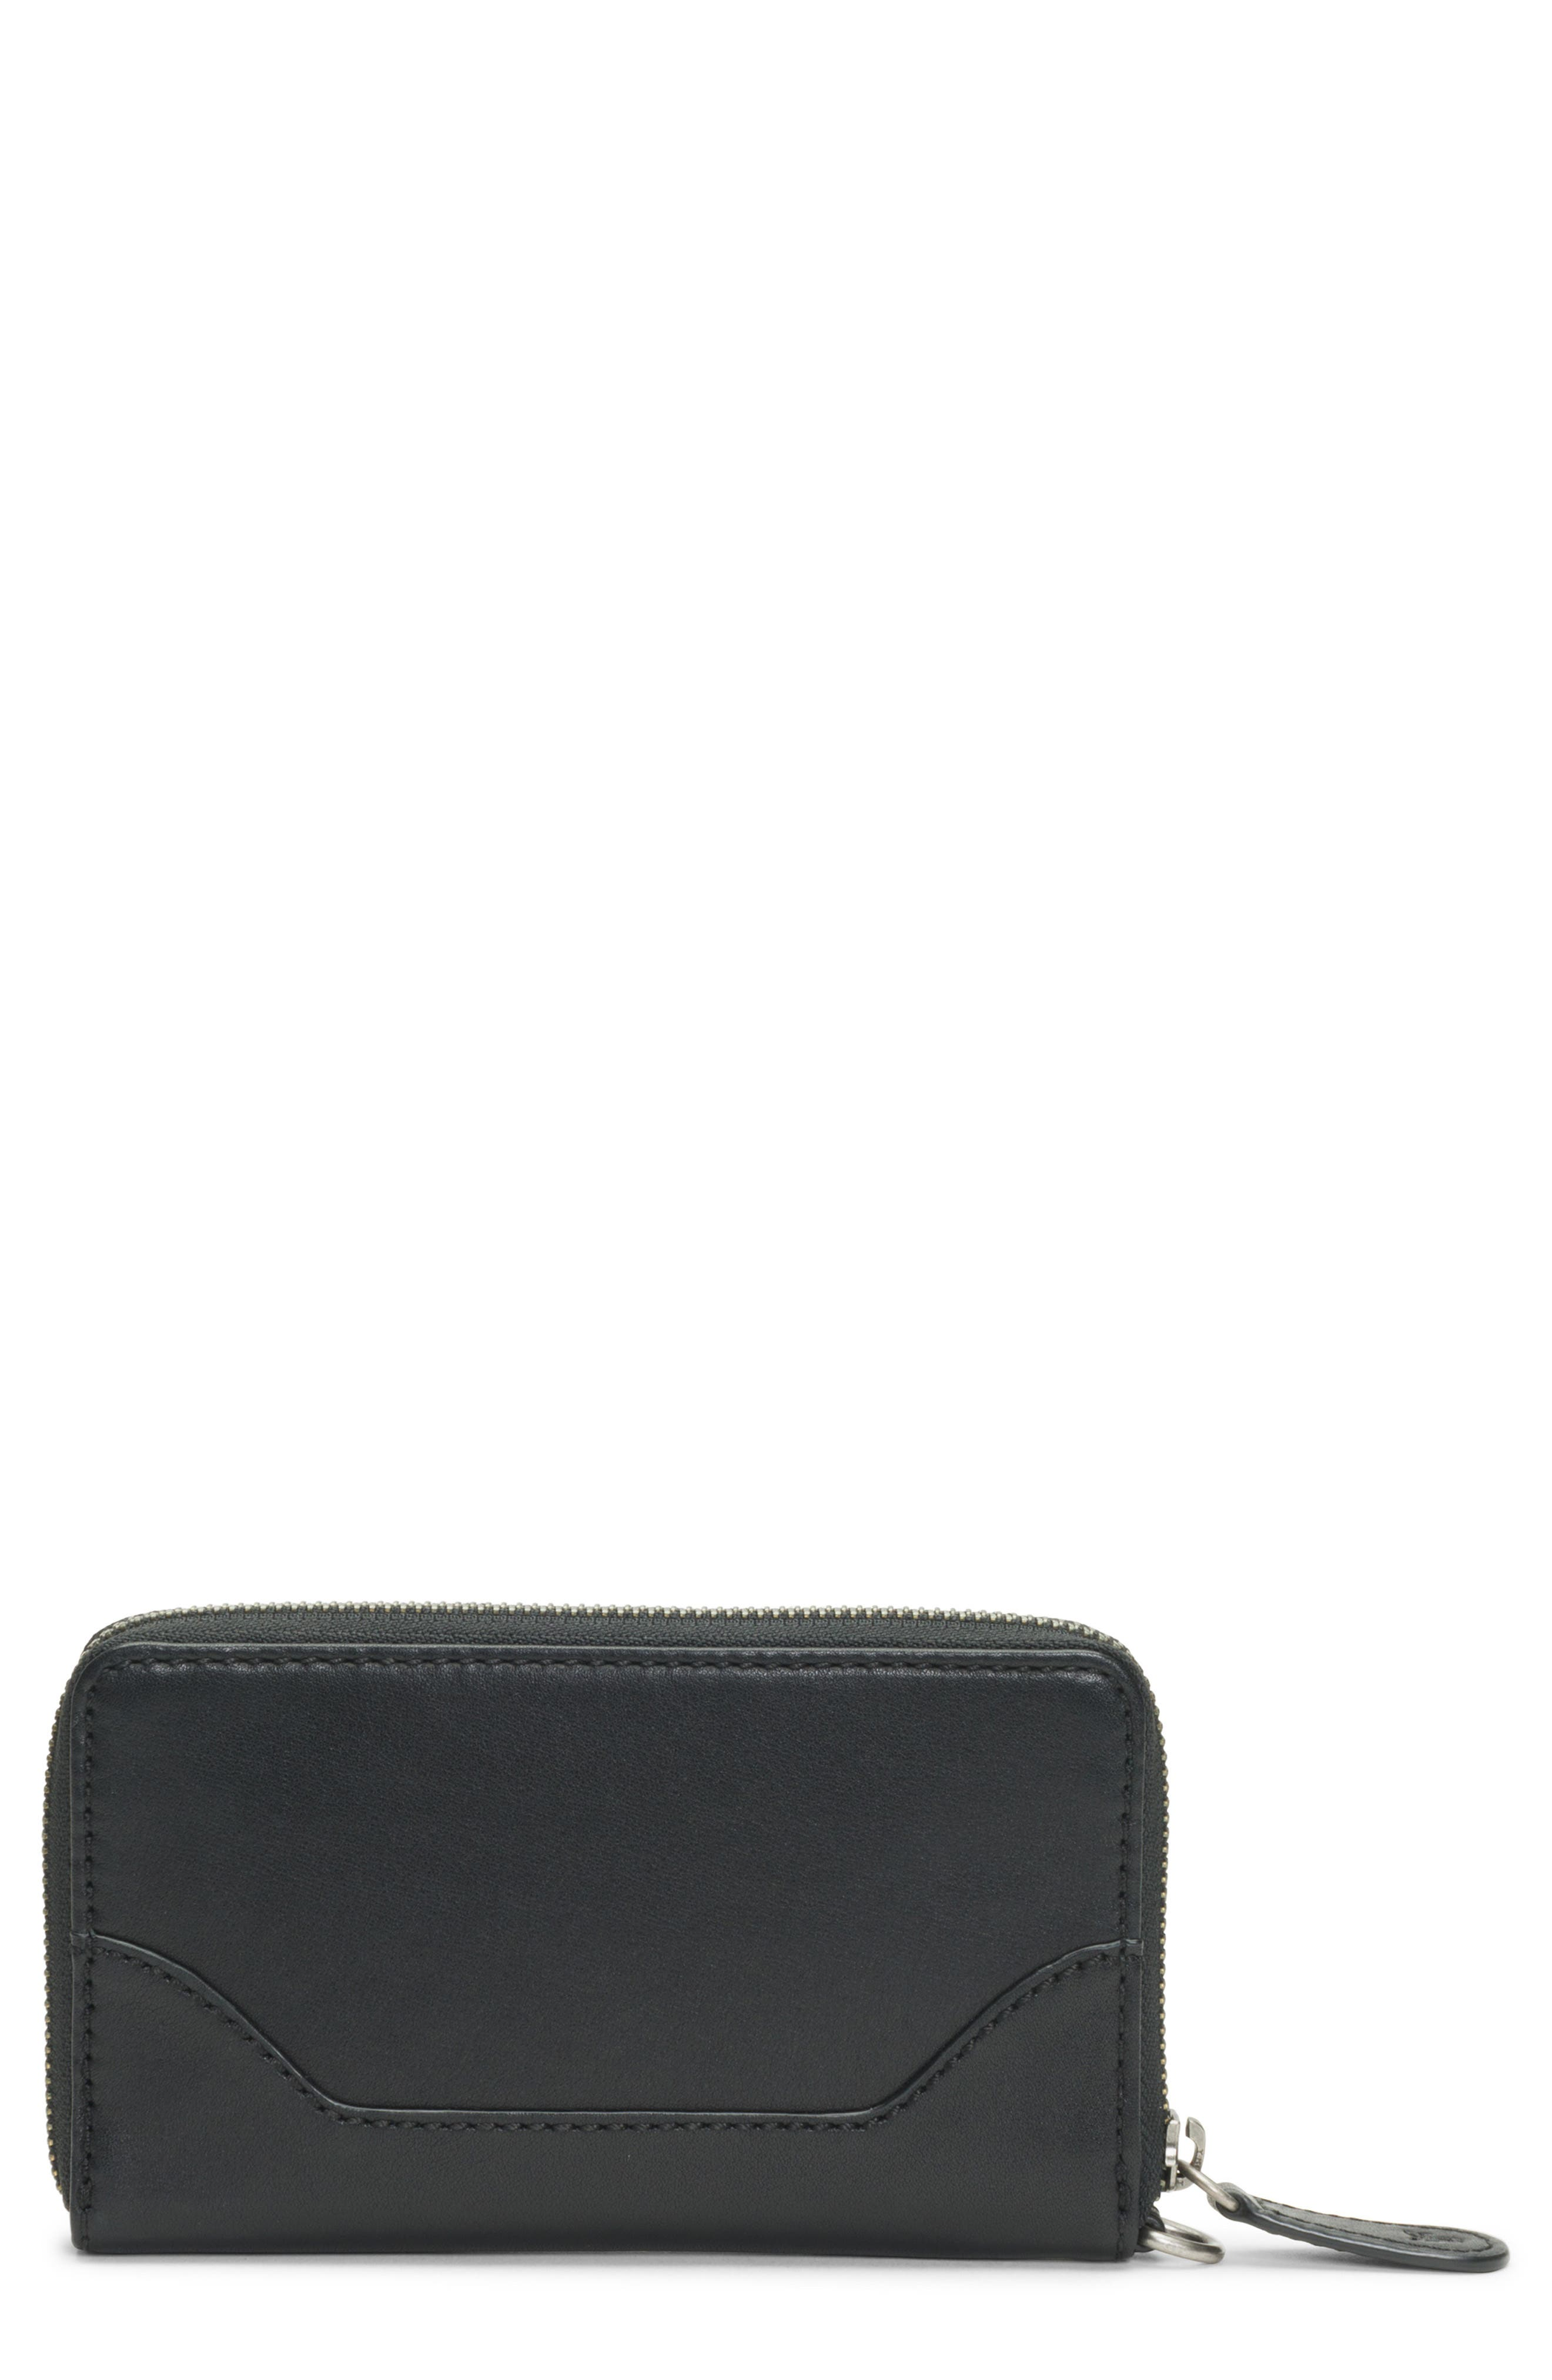 Melissa Leather Phone Wallet,                         Main,                         color, Black